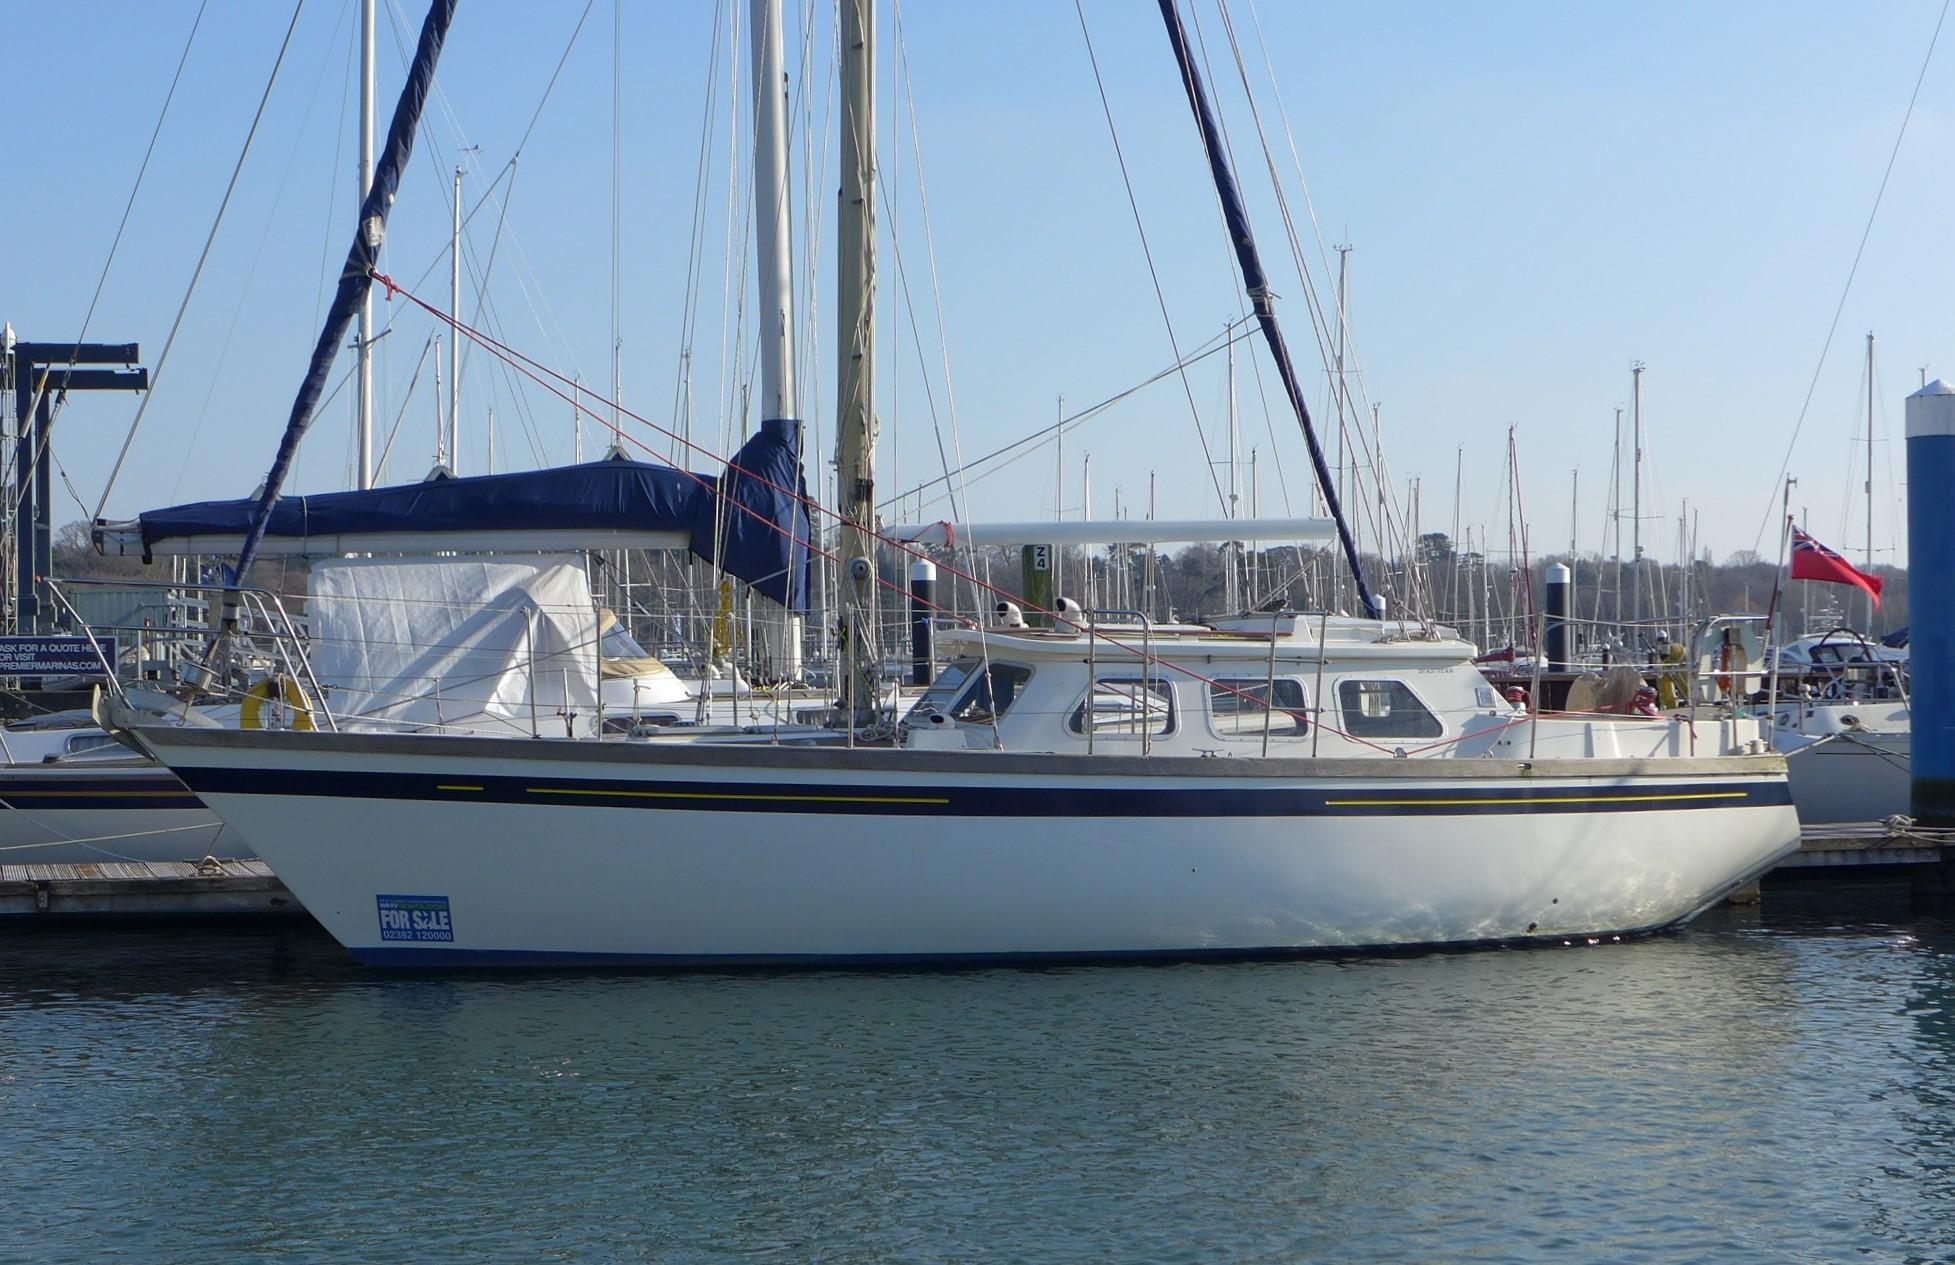 Seastream 34